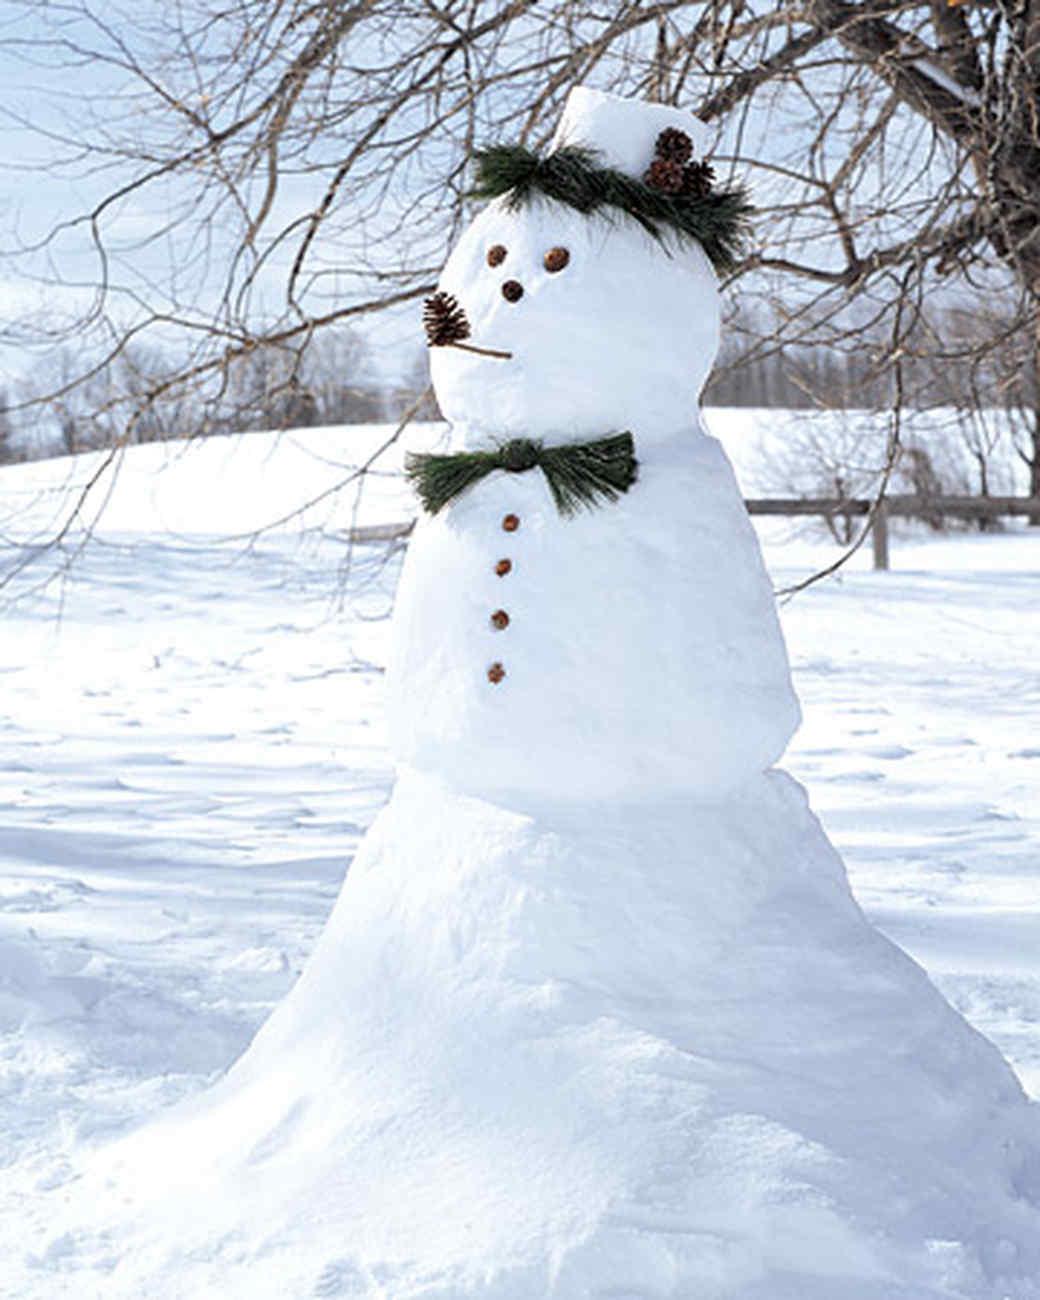 0106_msl_snowman.jpg